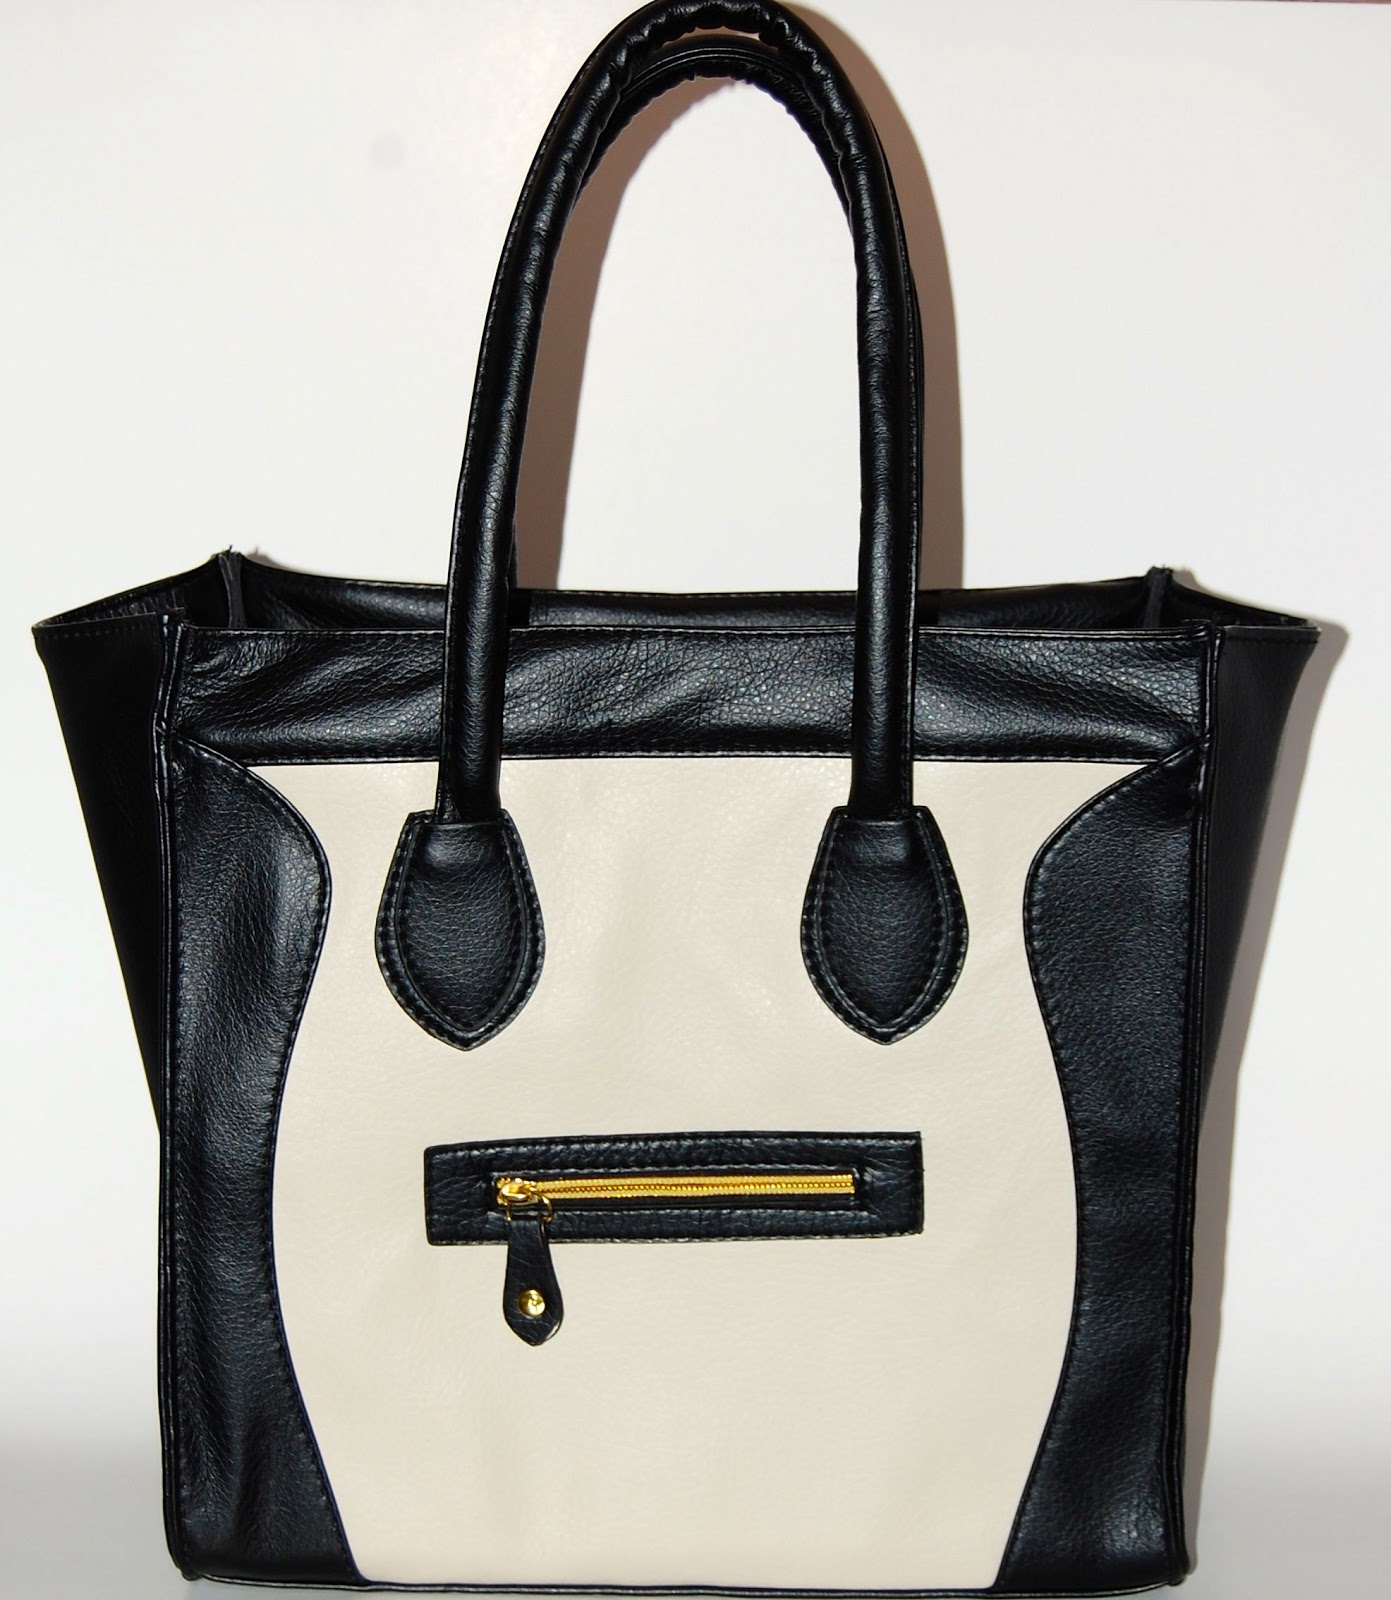 Celine Bag Look Alike